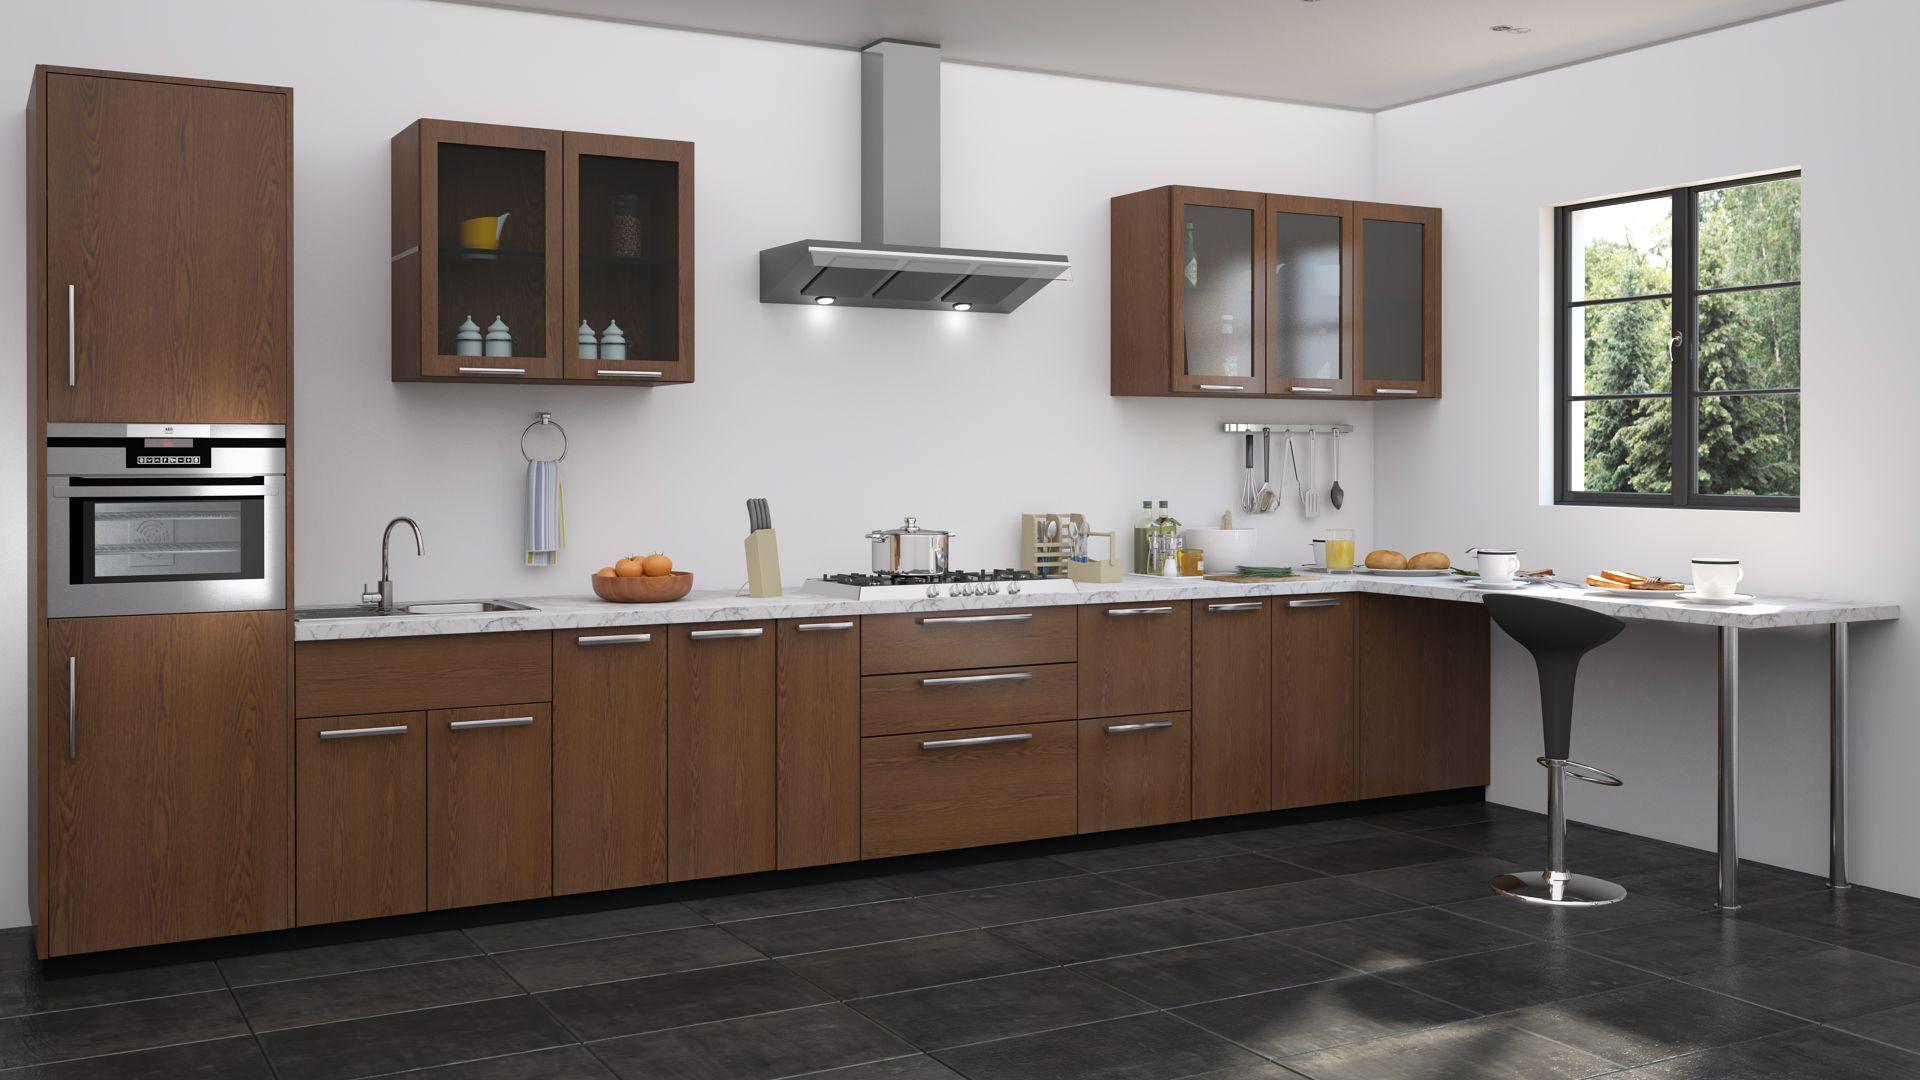 Modular kitchen ideas | Straight kitchen, L shaped kitchen ...